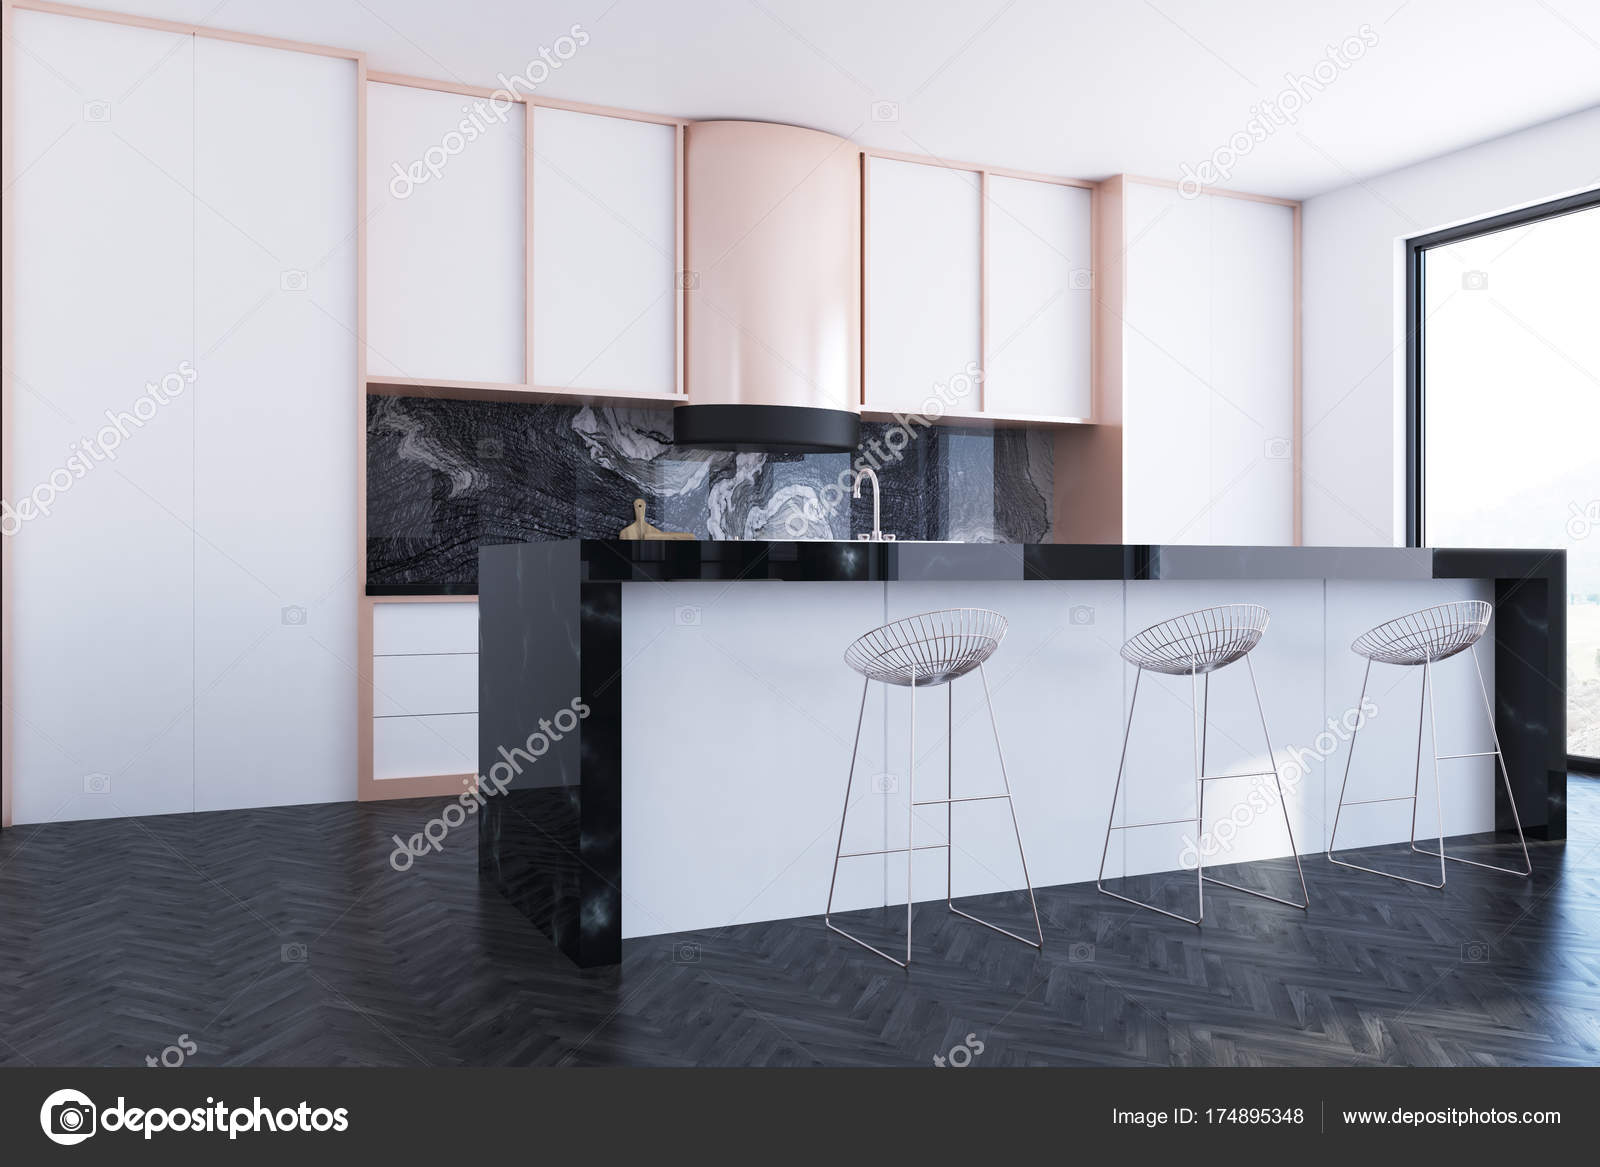 Keuken Bar Design : Wit en marmeren keuken bar kant u2014 stockfoto © denisismagilov #174895348